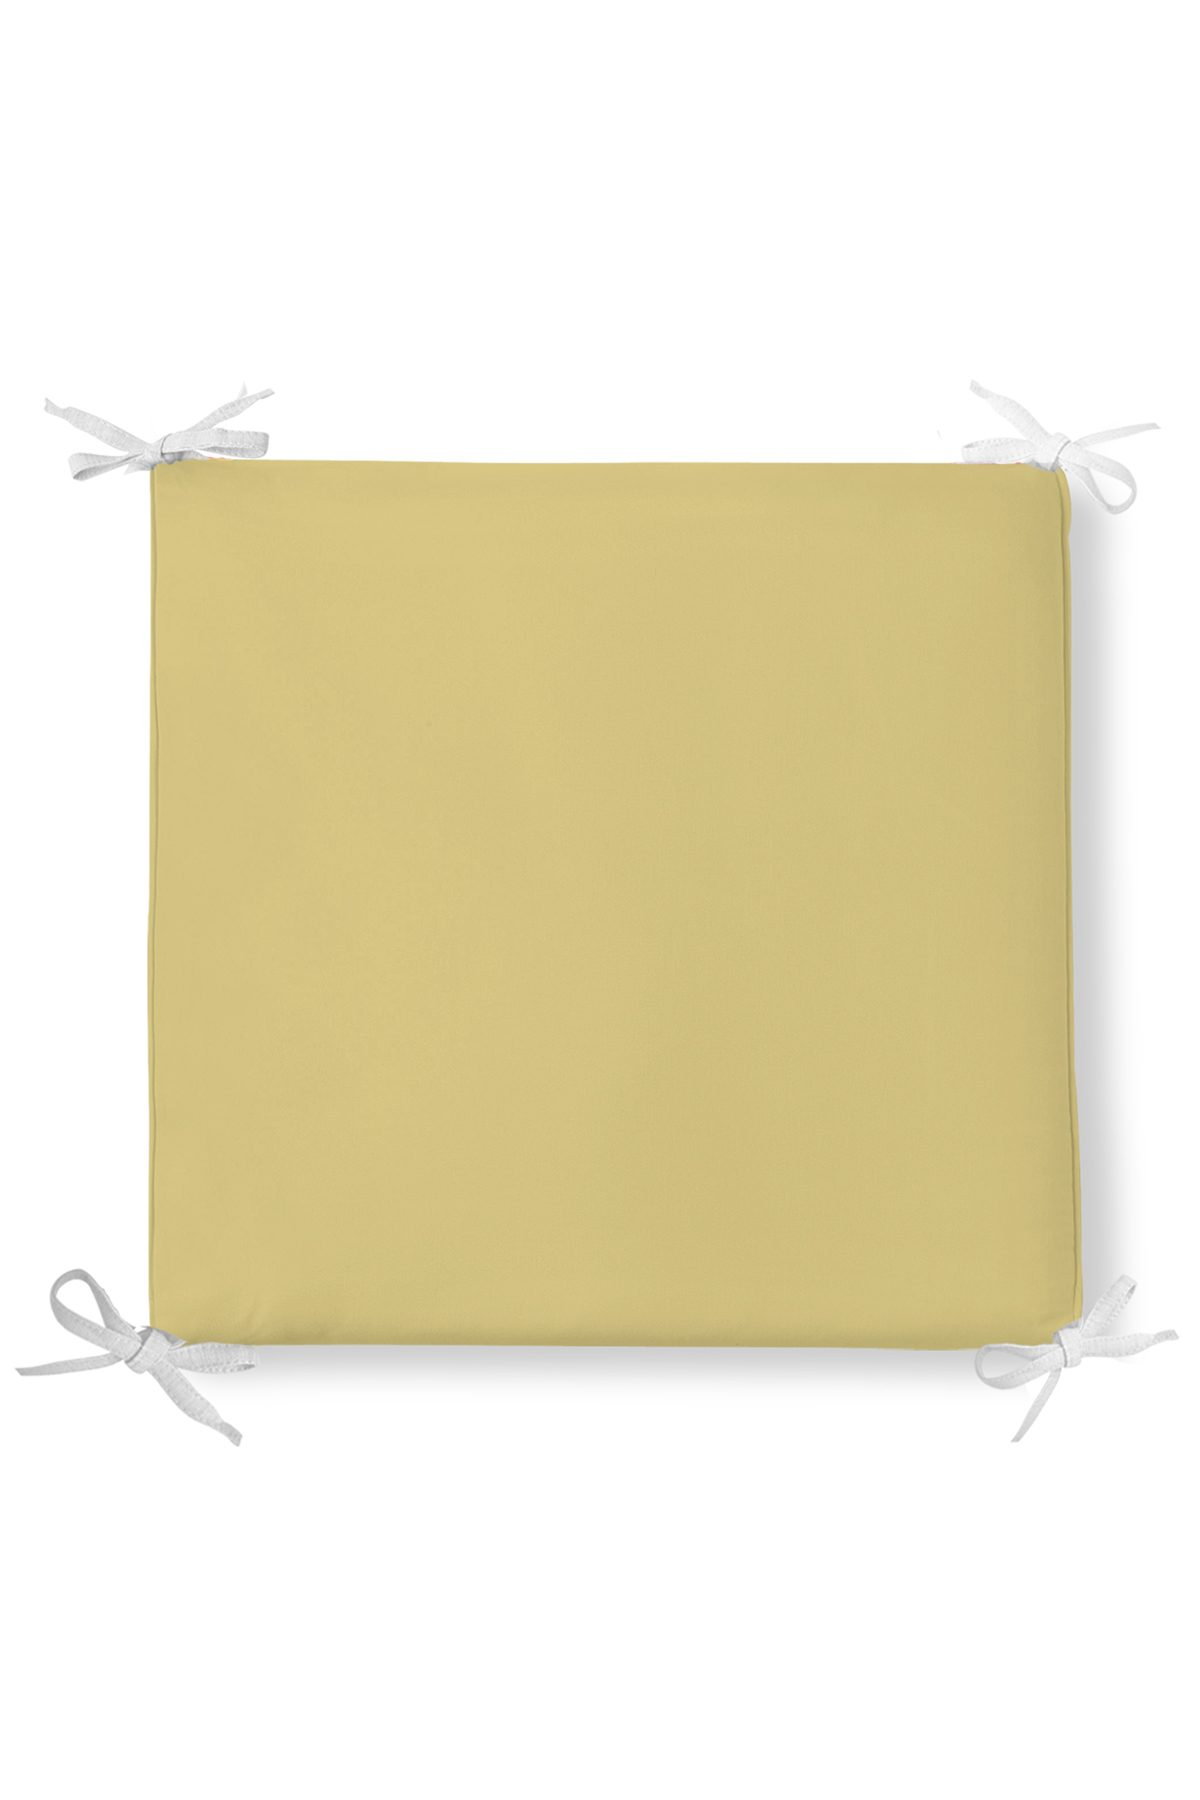 Hardal Renkli Dekorati Kare Sandalye Minderi 40x40cm ermuarlı Realhomes